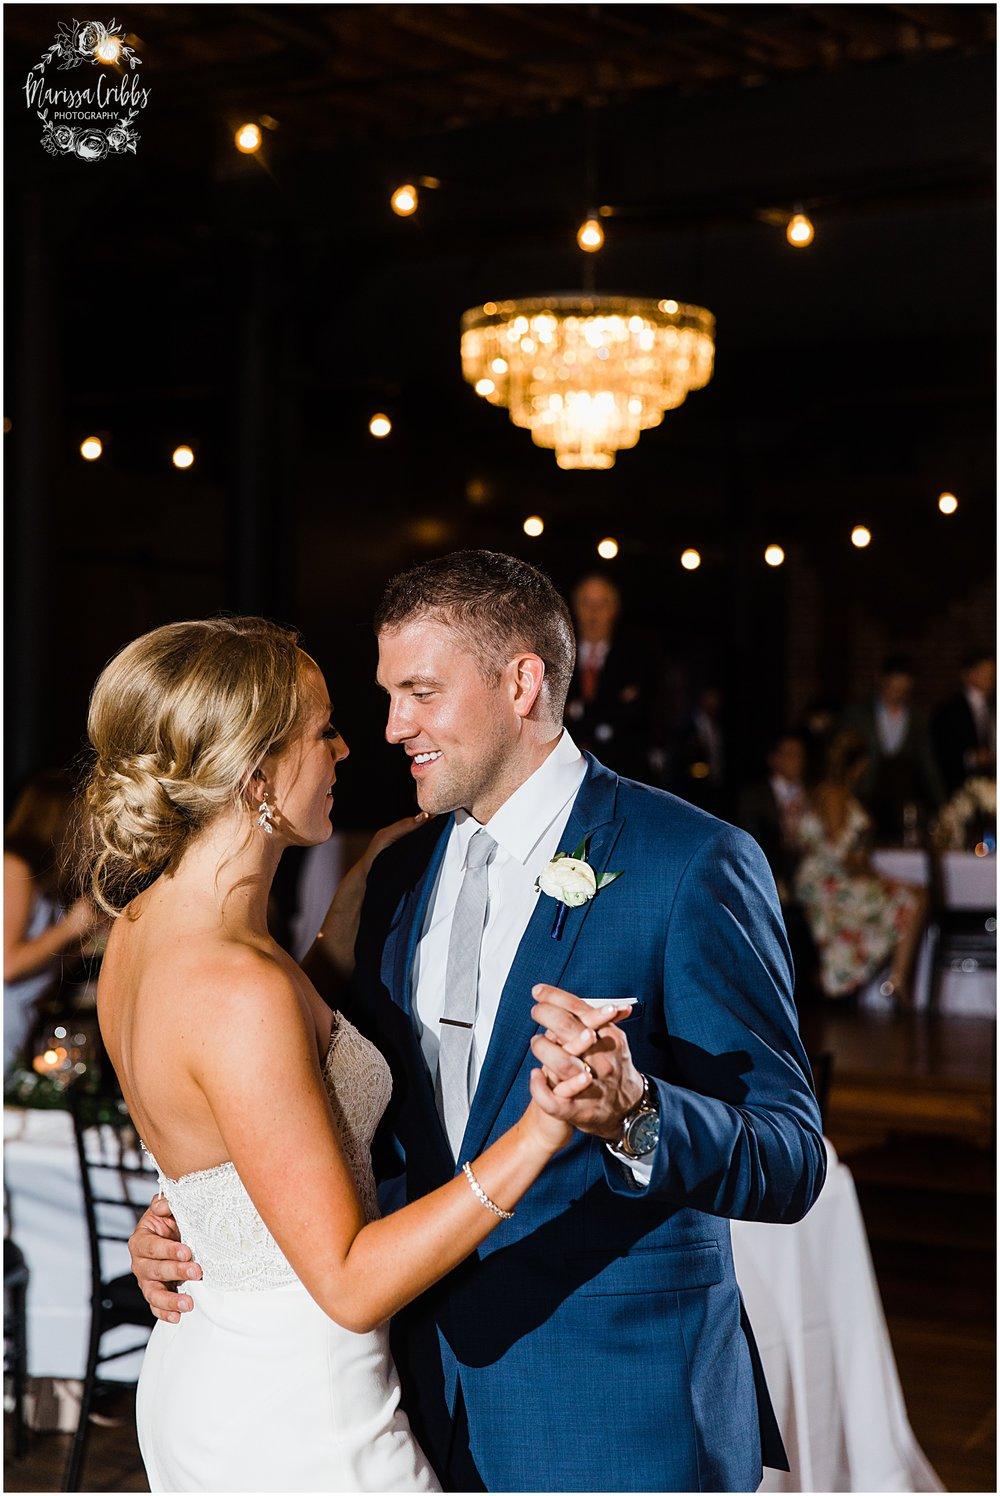 MAGNOLIA VENUE WEDDING | CHARLIE & NATALIE | MARISSA CRIBBS PHOTOGRAPHY_5799.jpg